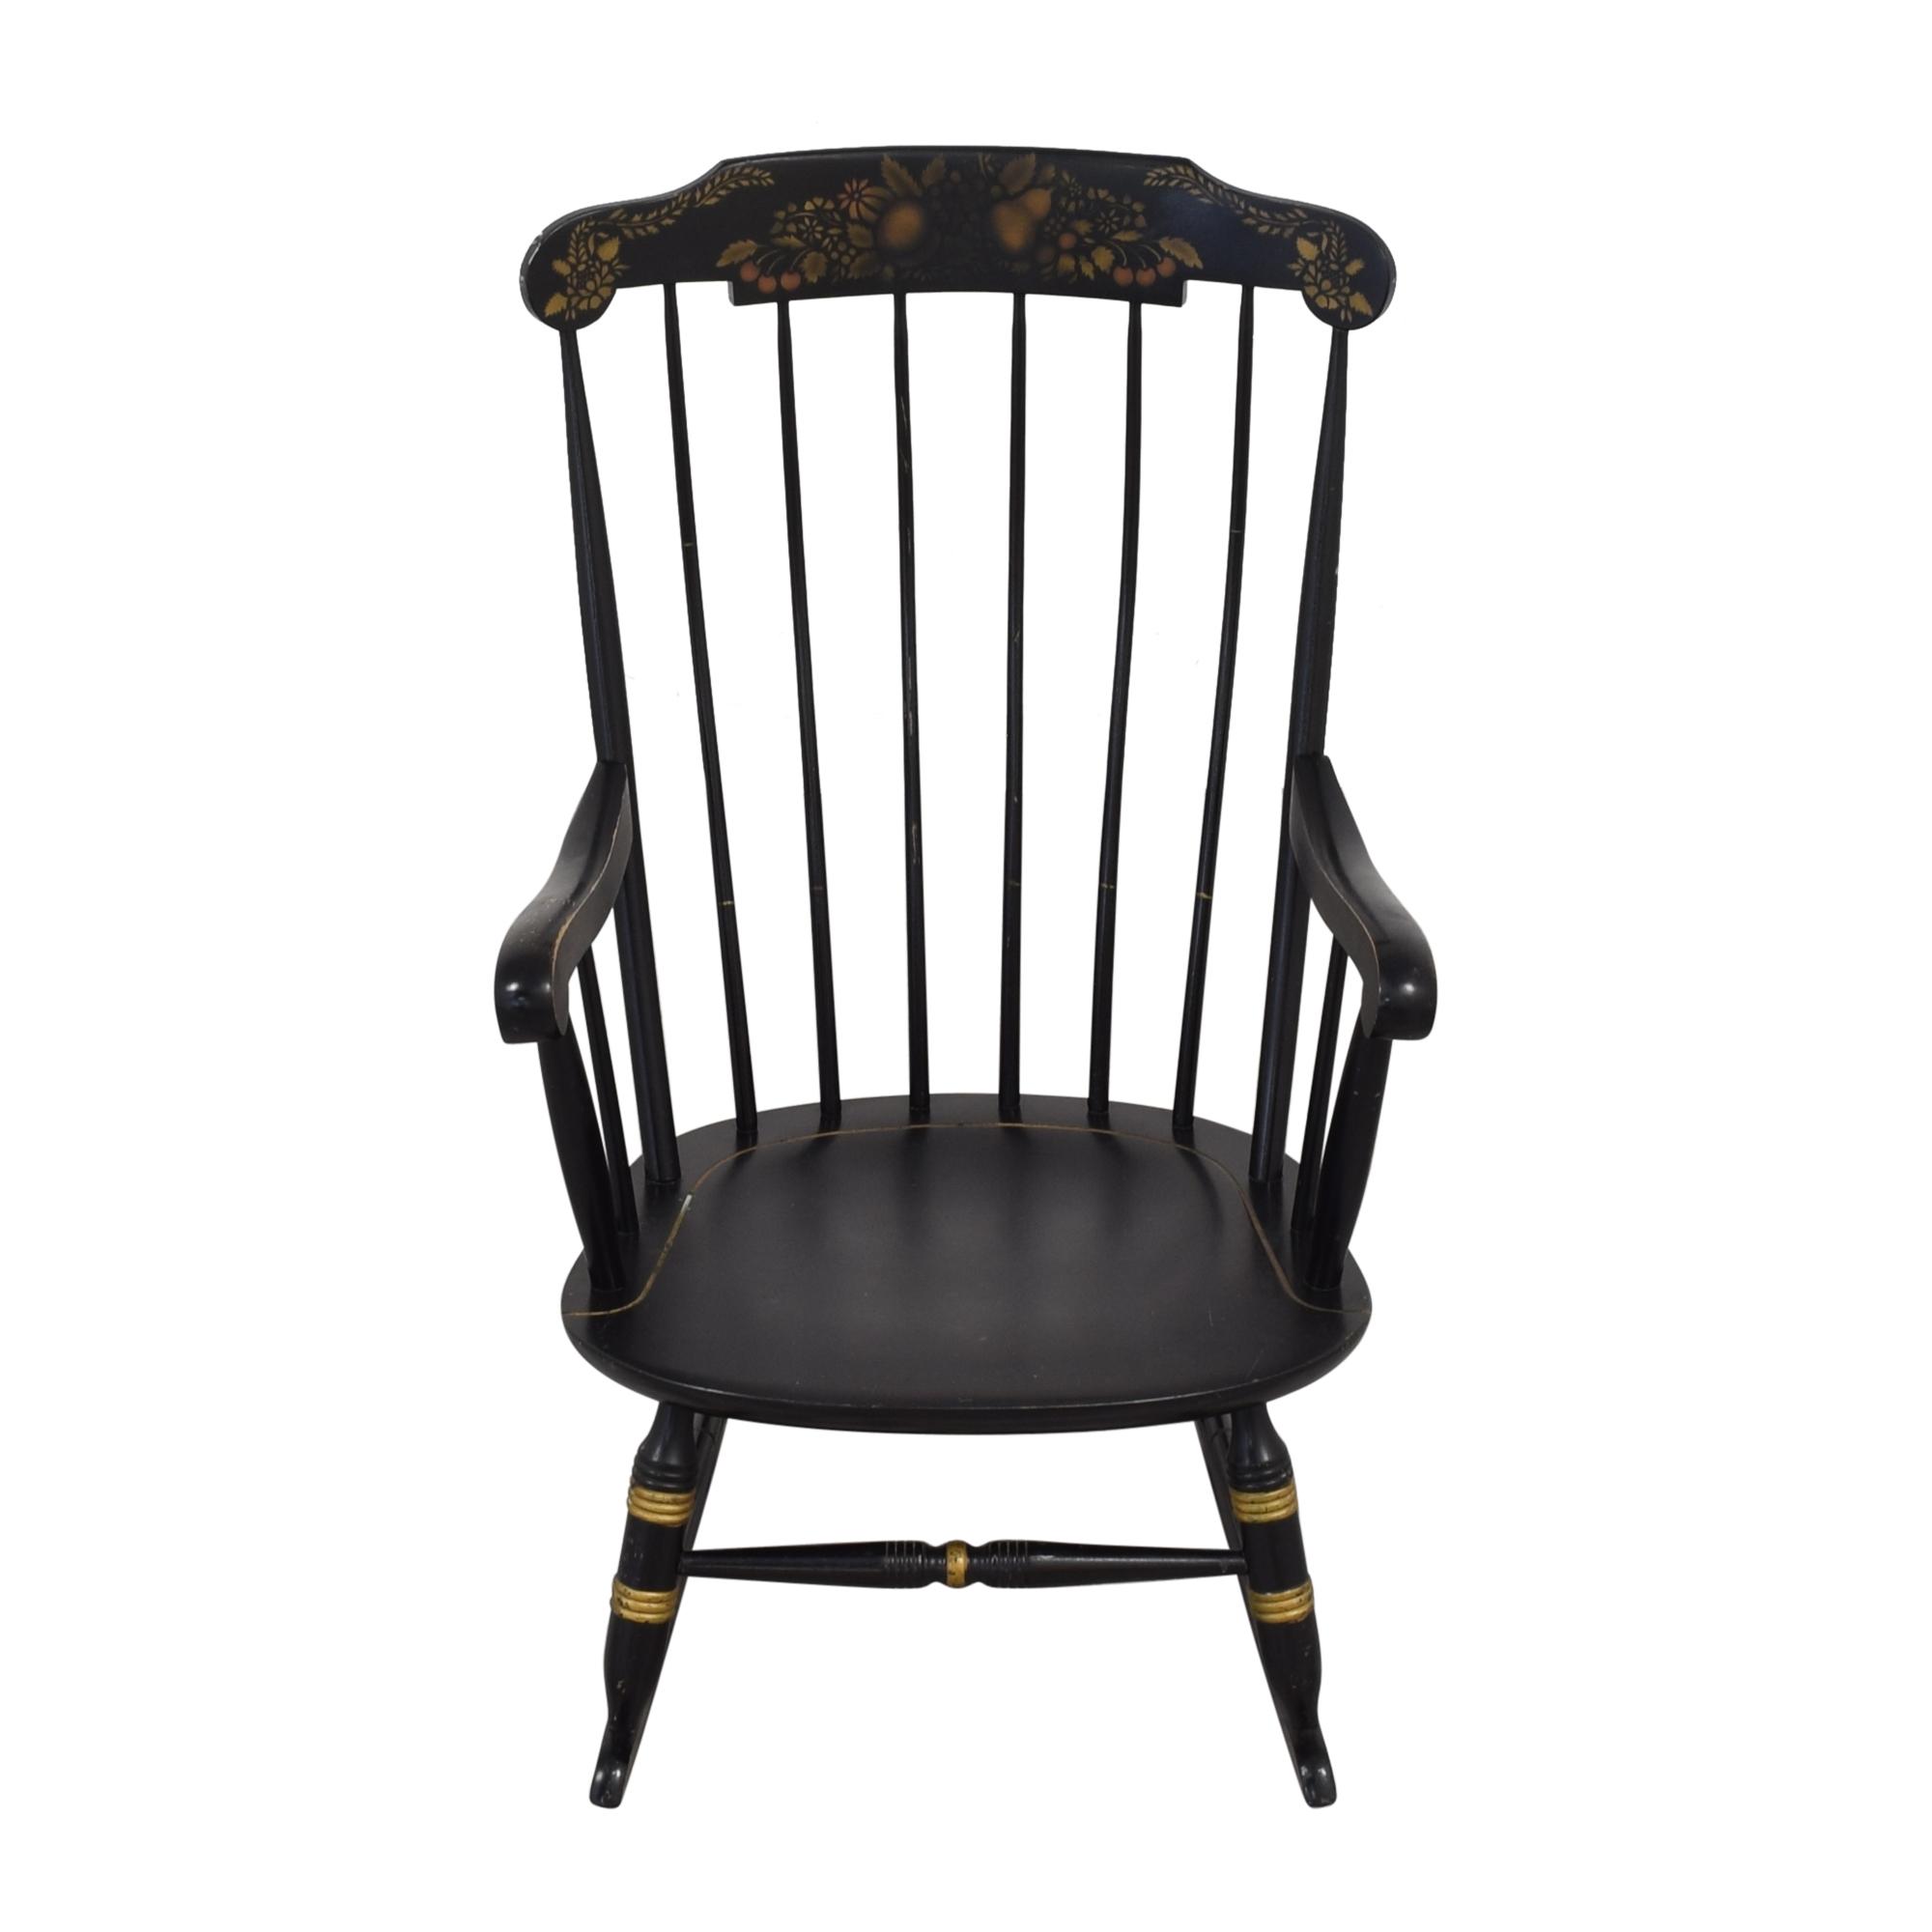 Nichols & Stone Nichols & Stone Rocking Chair nj